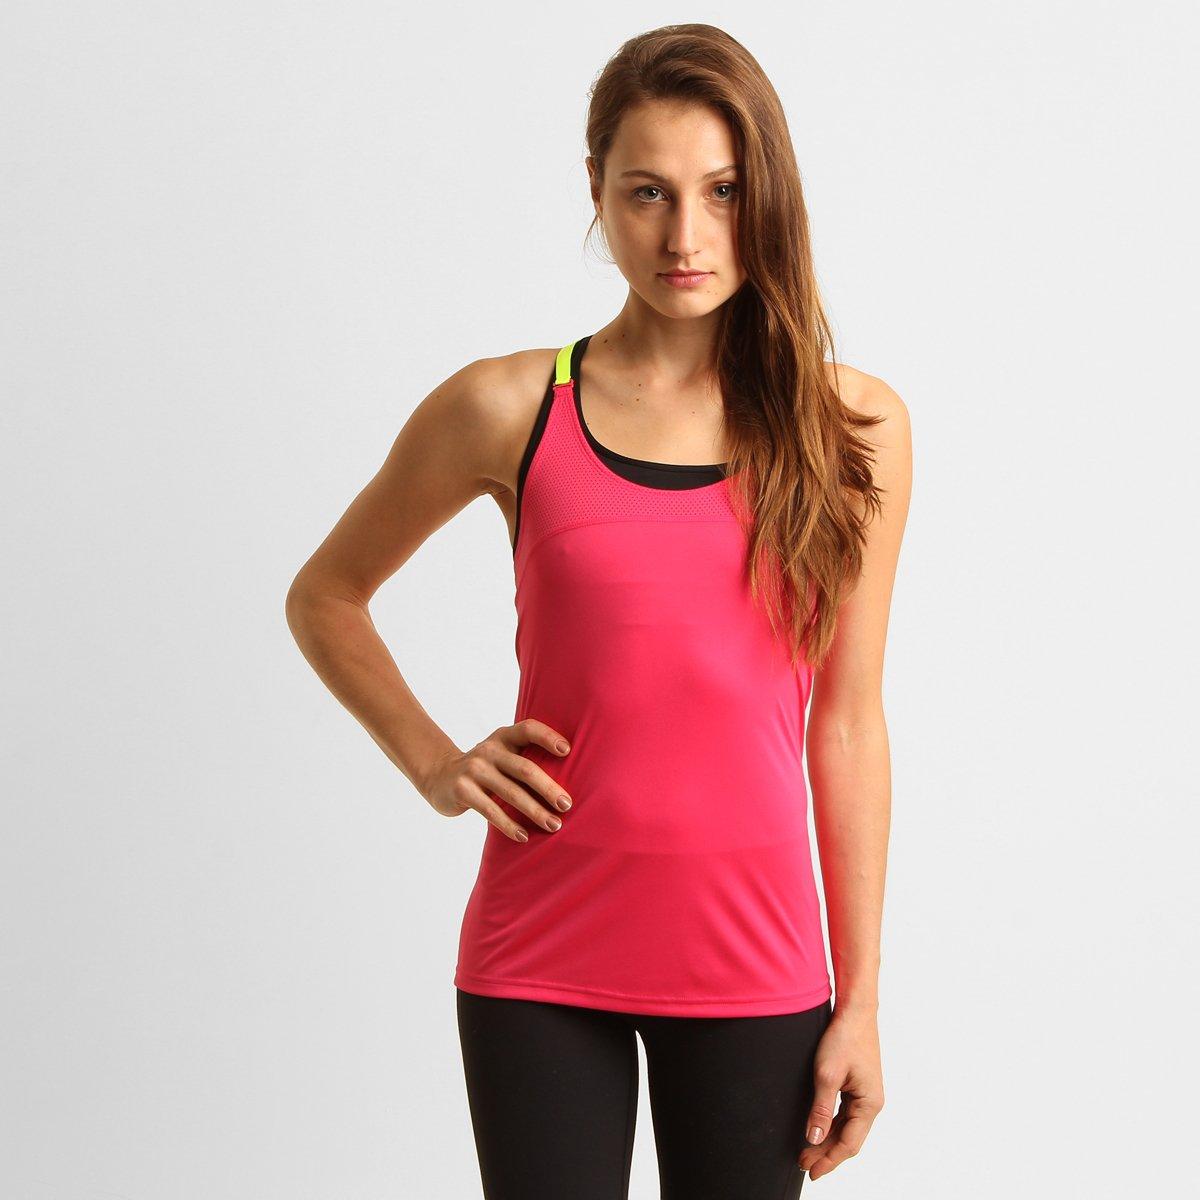 71c24288158 Camiseta Regata Reebok RE - Compre Agora